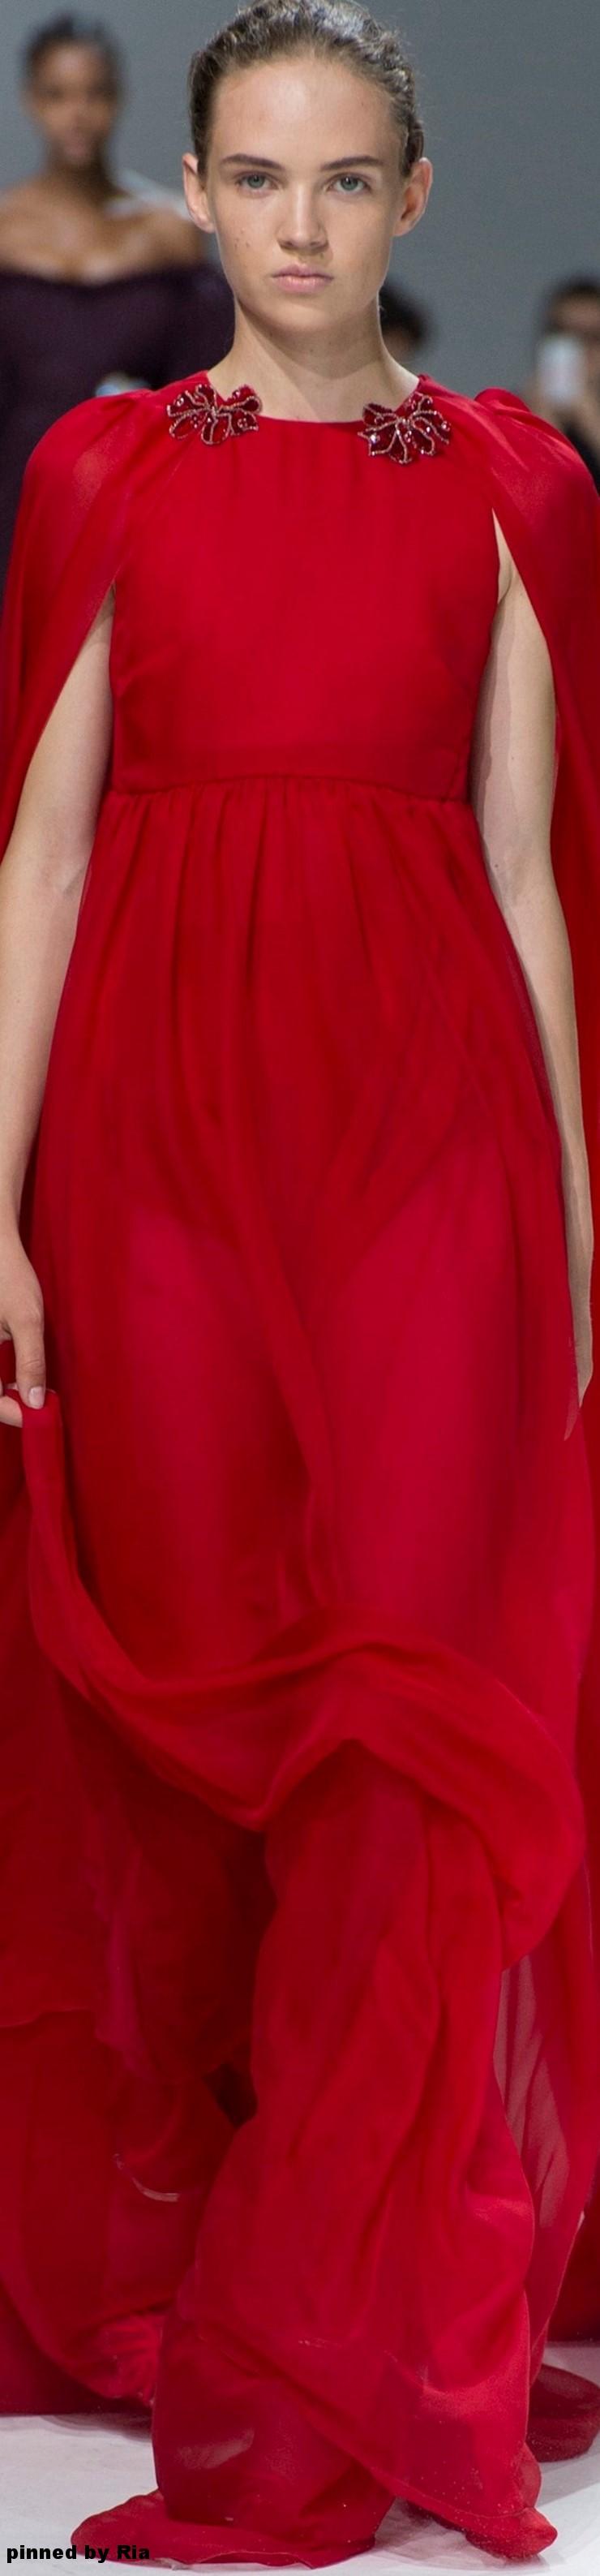 Giambattista Valli FW 2016-17 Couture l Ria